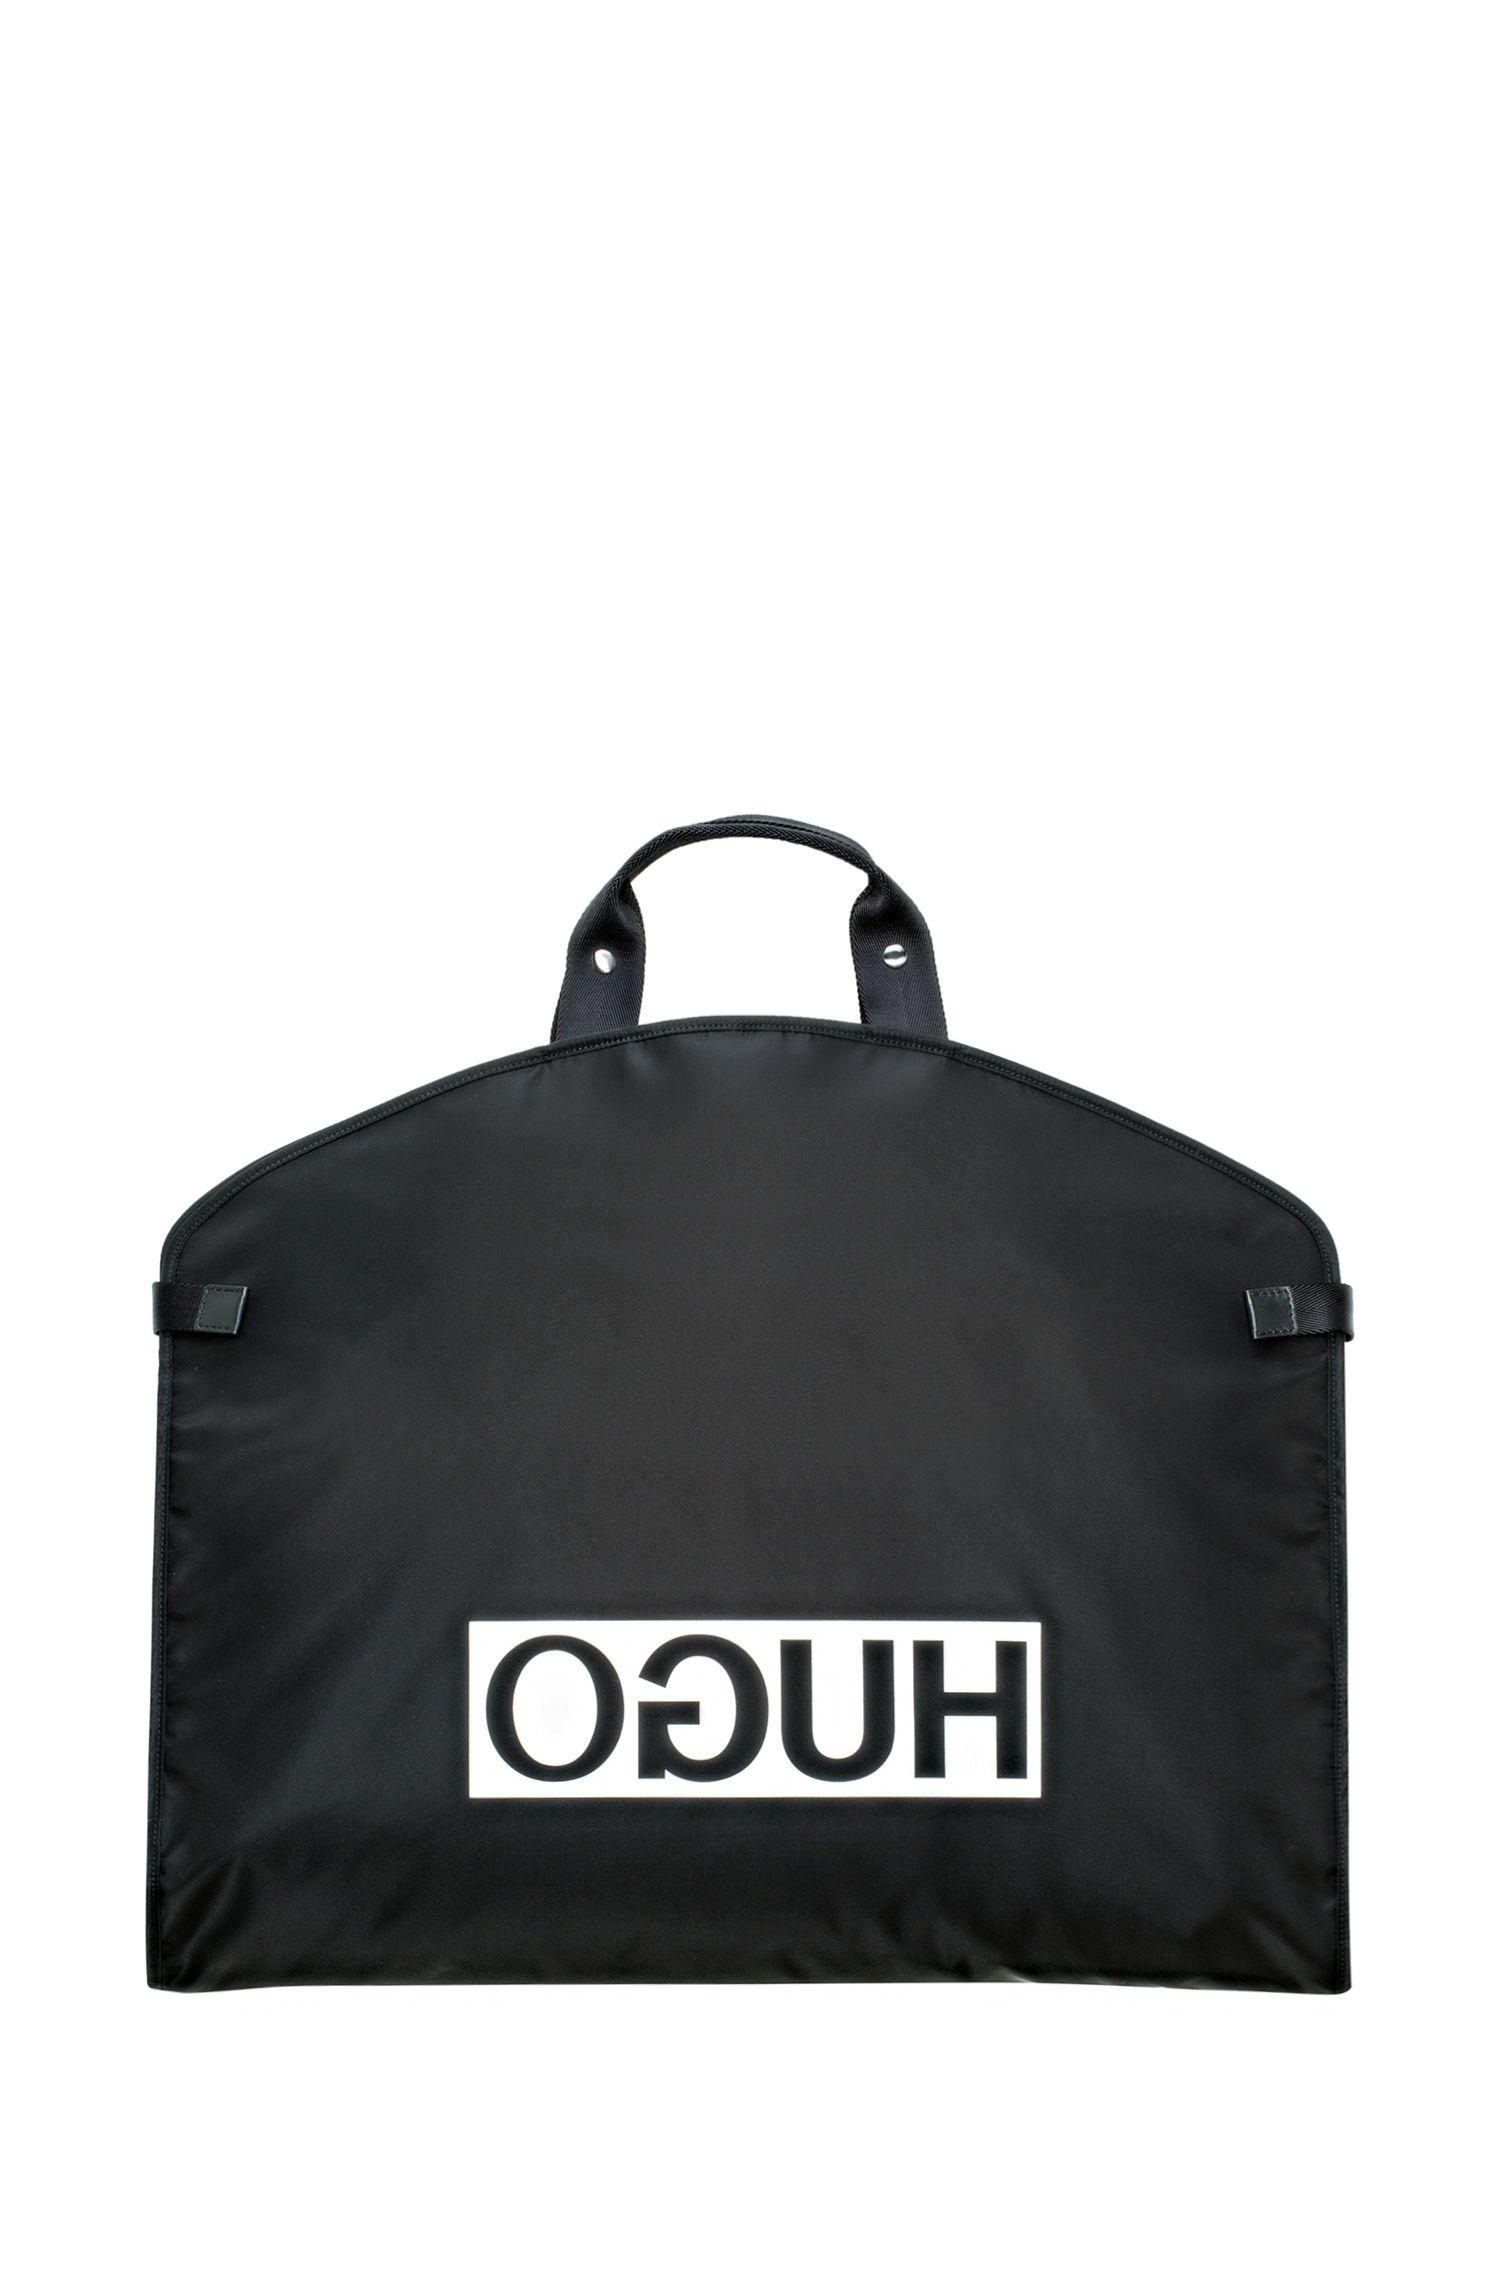 Kleiderbeutel aus Nylon-Gabardine mit Reversed-Logo